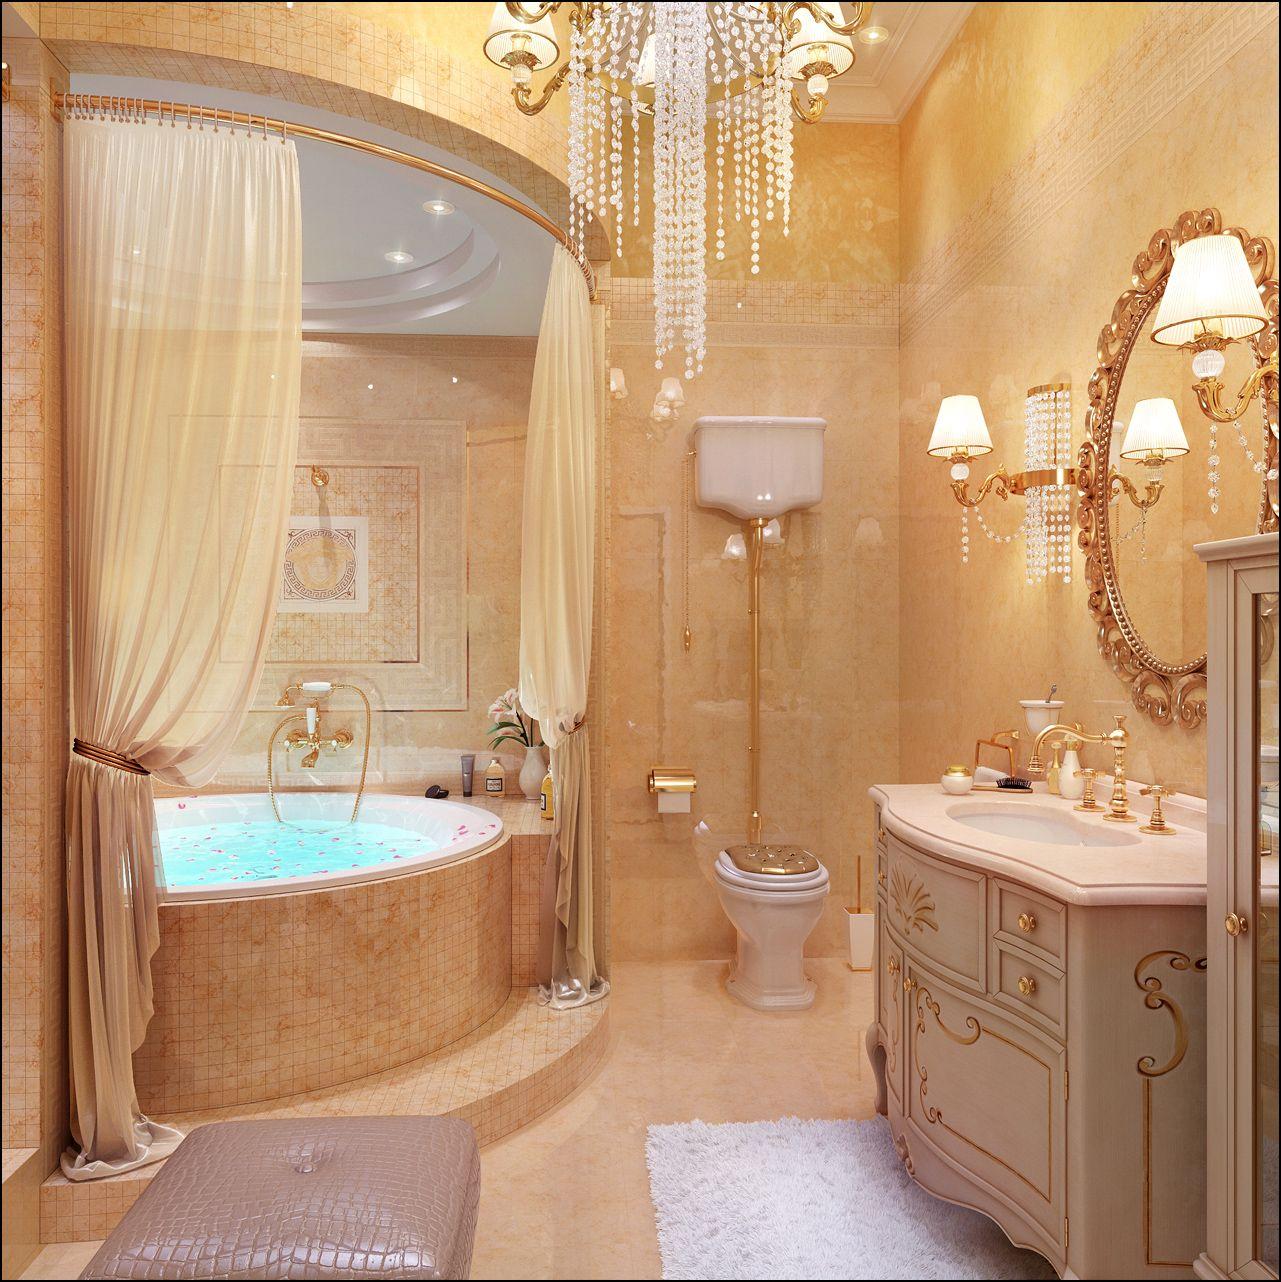 Luxury Home Interiors Bathroom: Bath With Jacuzi.